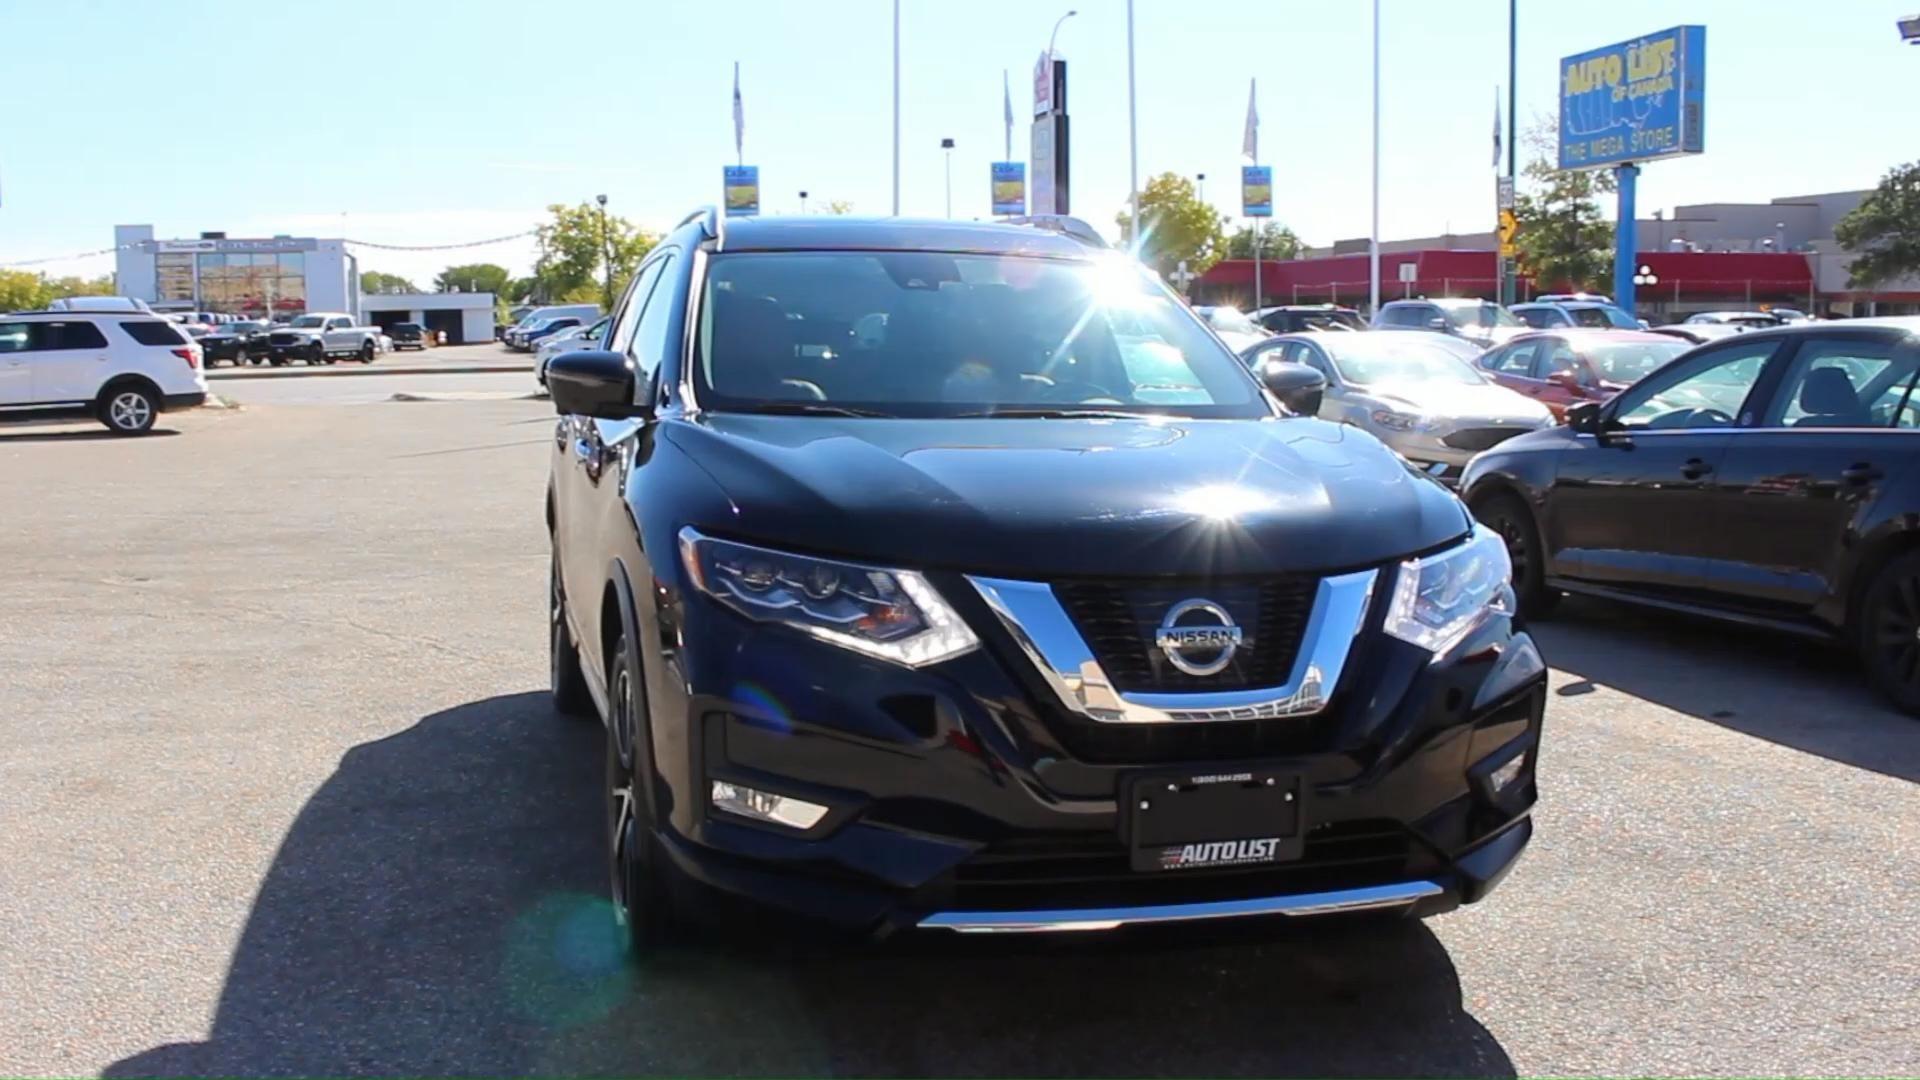 2017 Nissan Rogue Sl Platinum Video Nissan Rogue Used Cars Nissan Rogue Sl